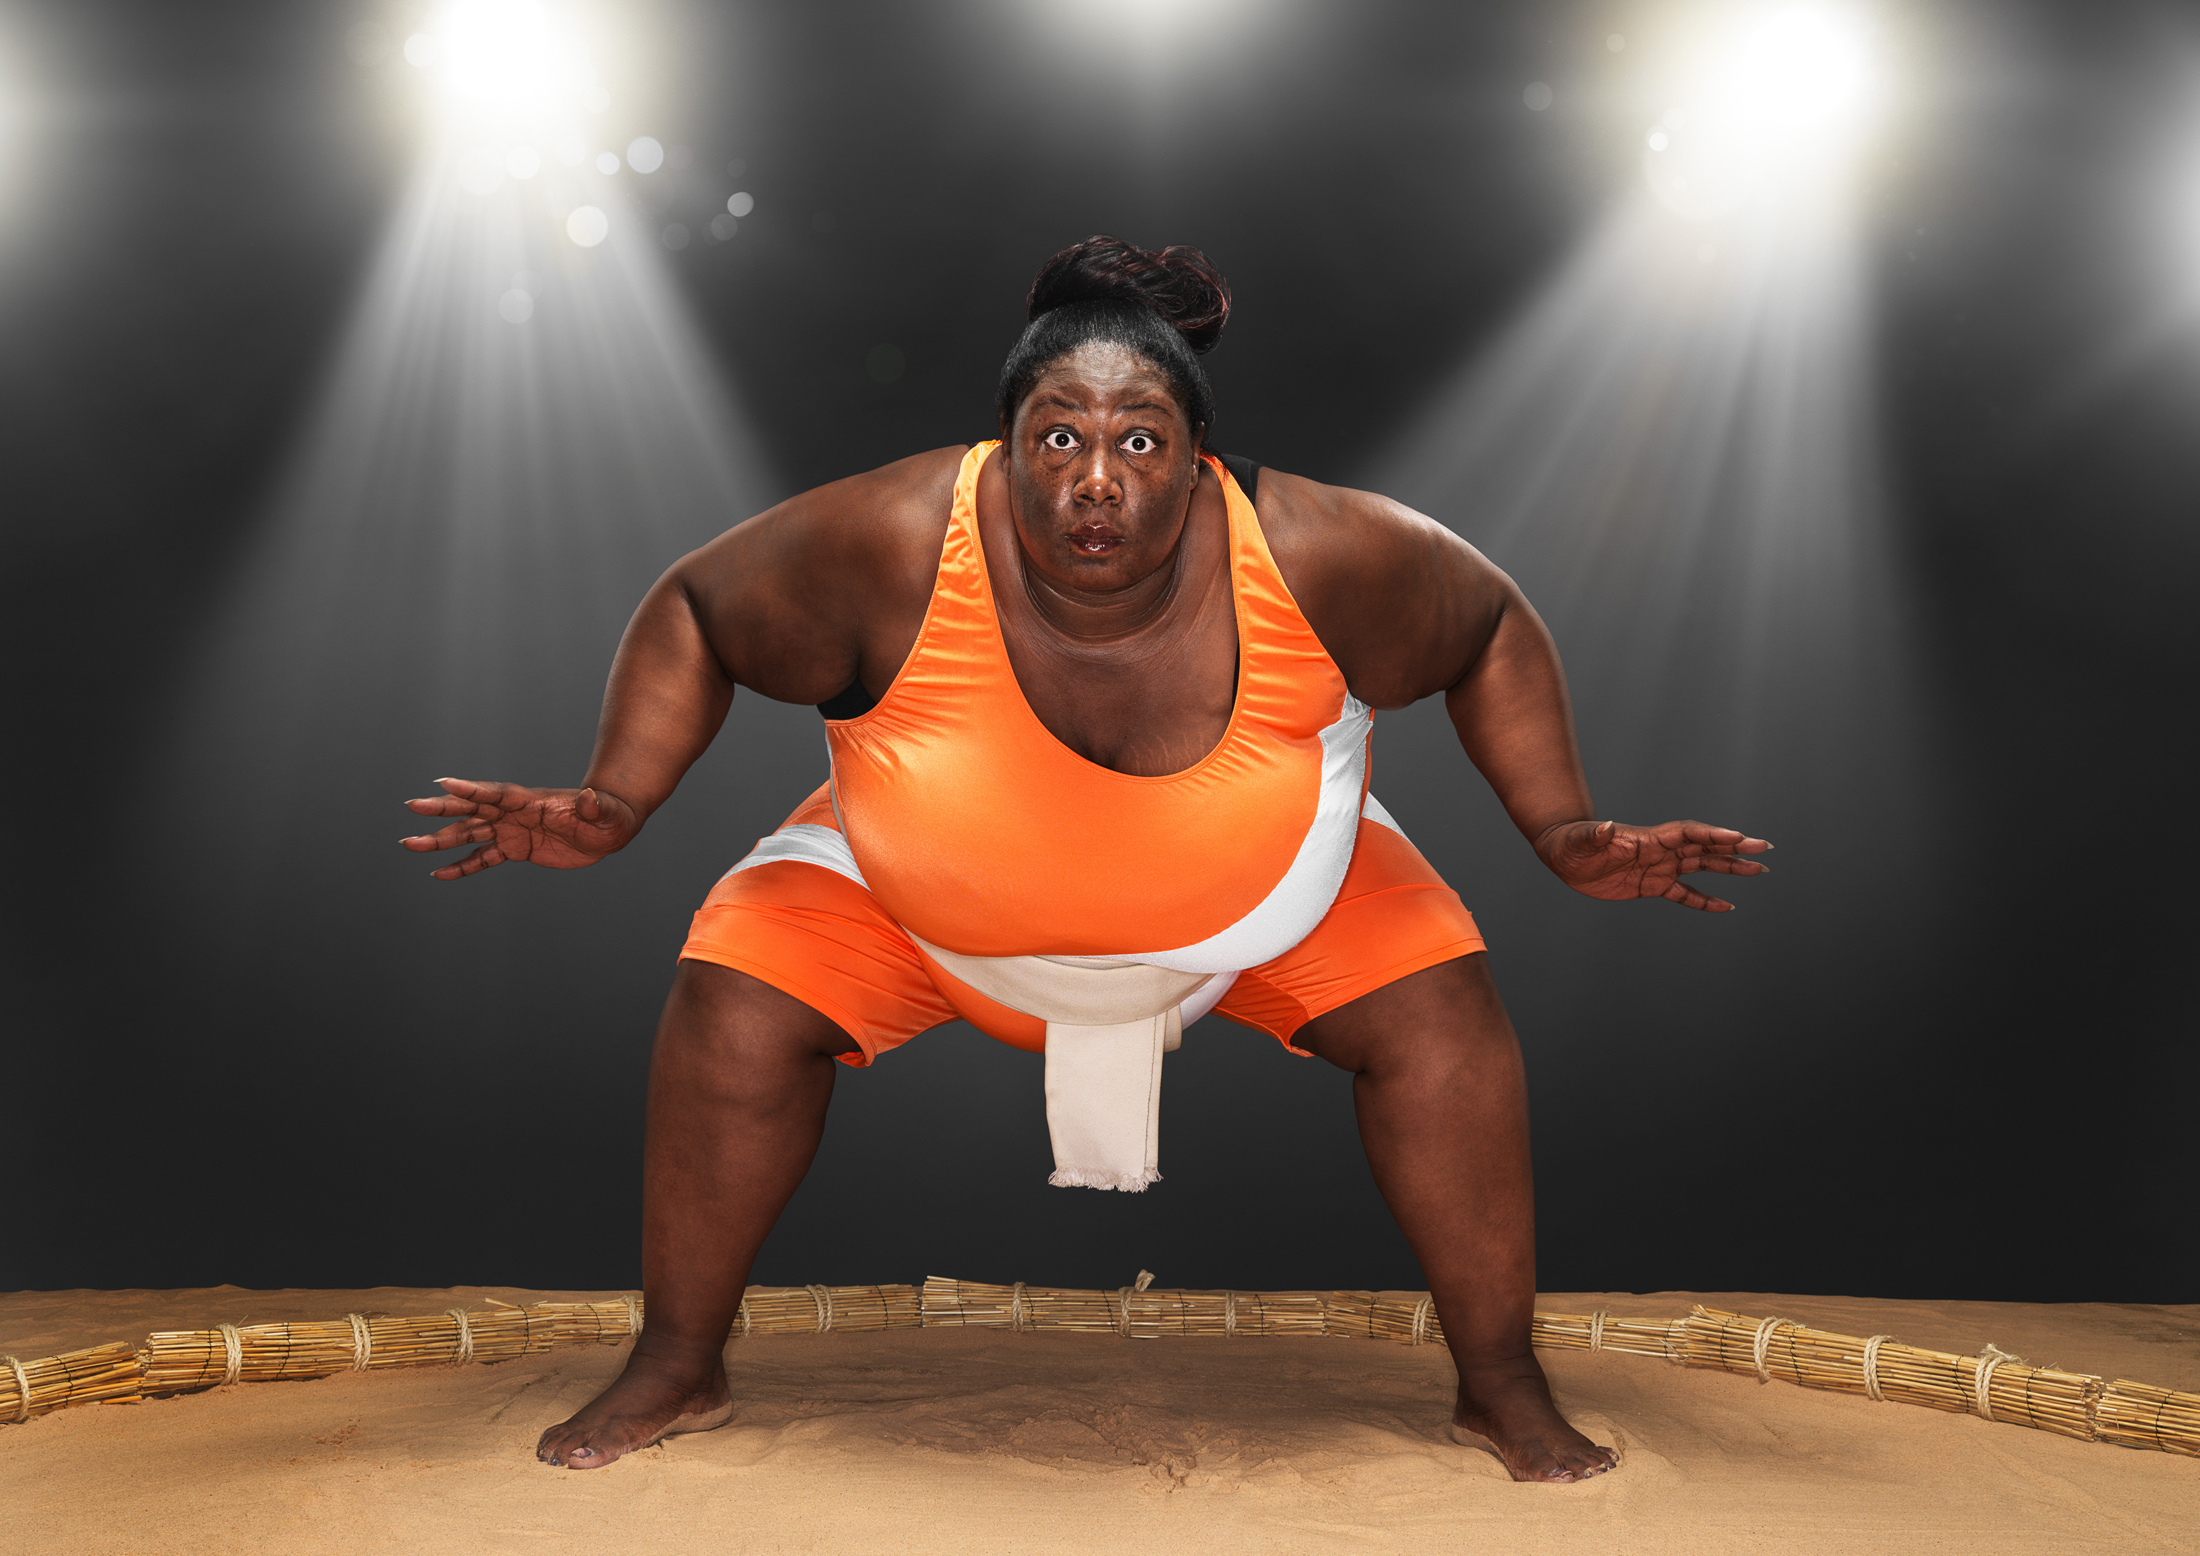 RanaldMackechnie.GWR.Sharran Alexander. Heaviest sportswoman.jpg